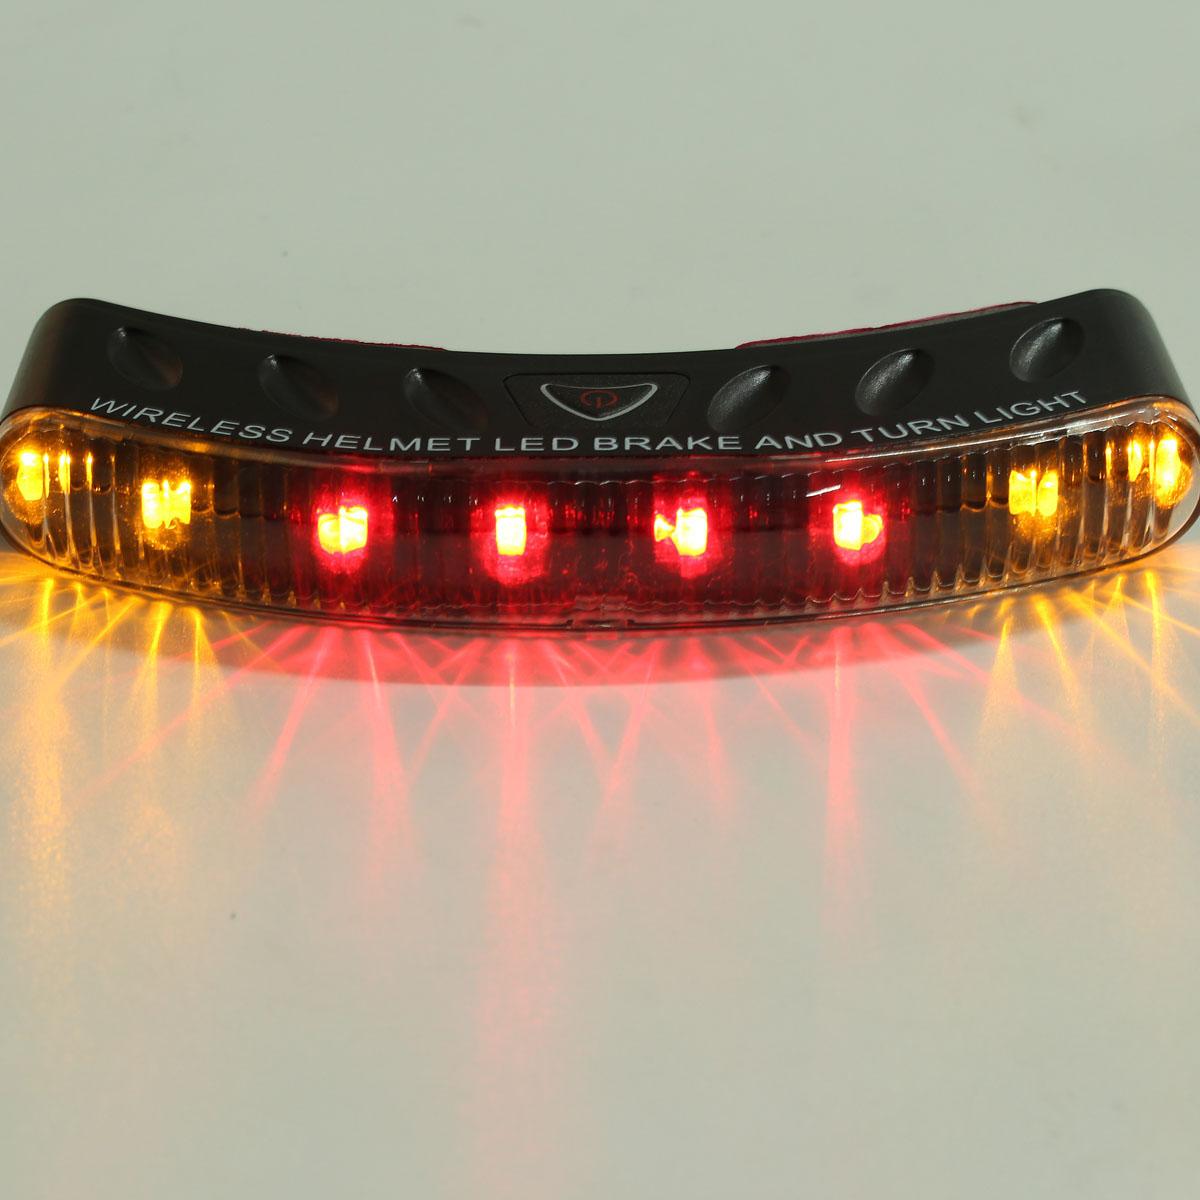 12V Wireless 8 LED Motor Bike Motorcycle Turn Signal Brake Lamp Helmet Safety Light For Honda(China (Mainland))